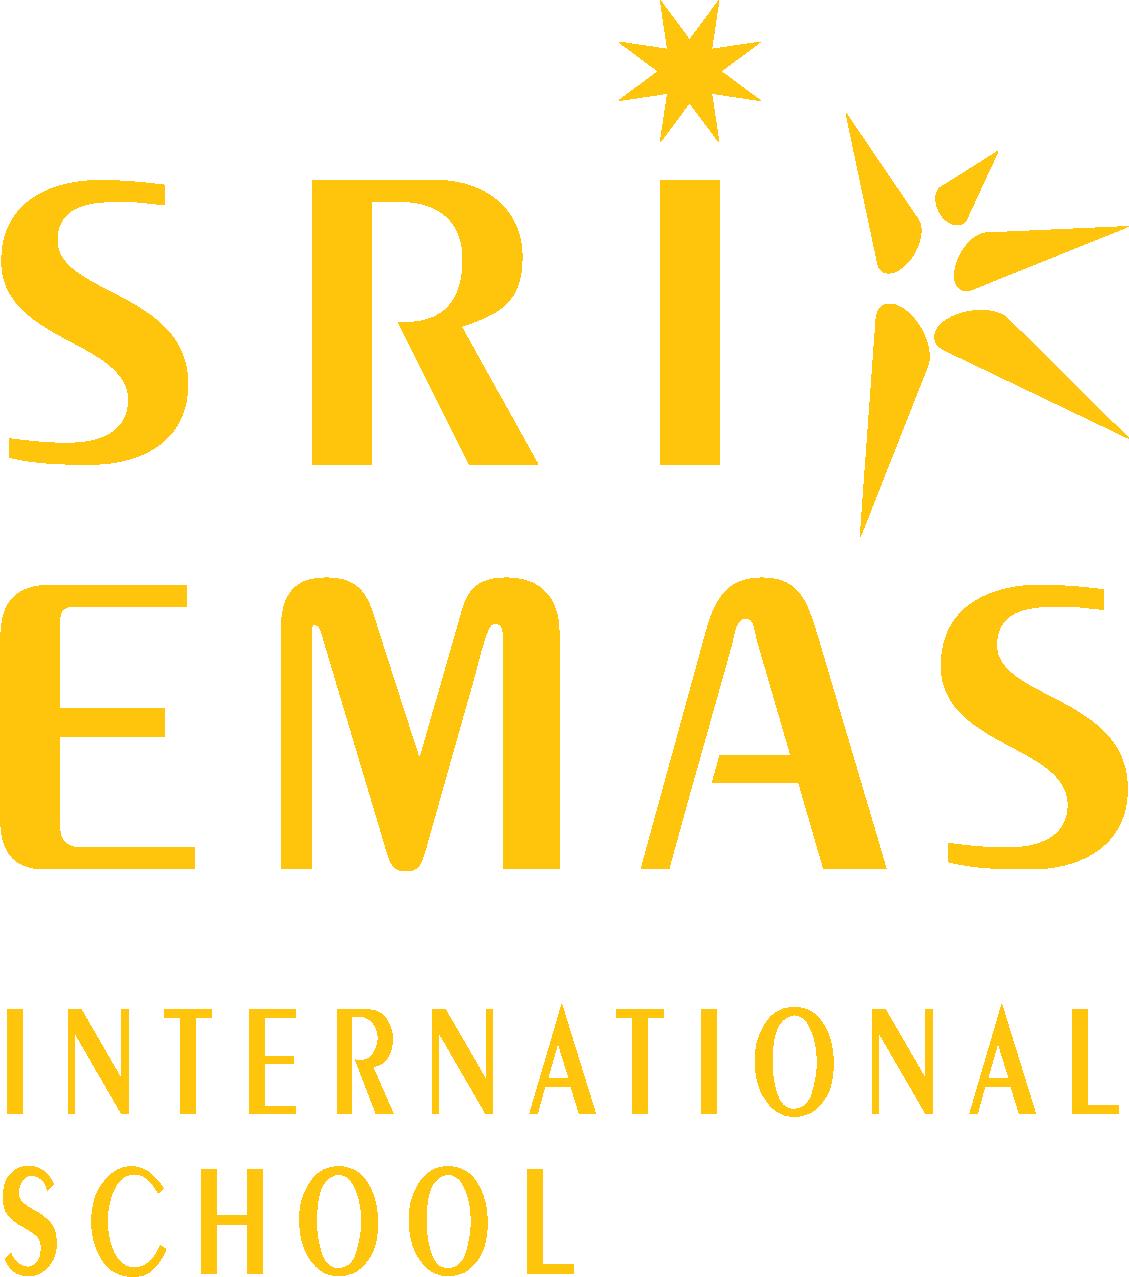 Sri Emas International School's logo